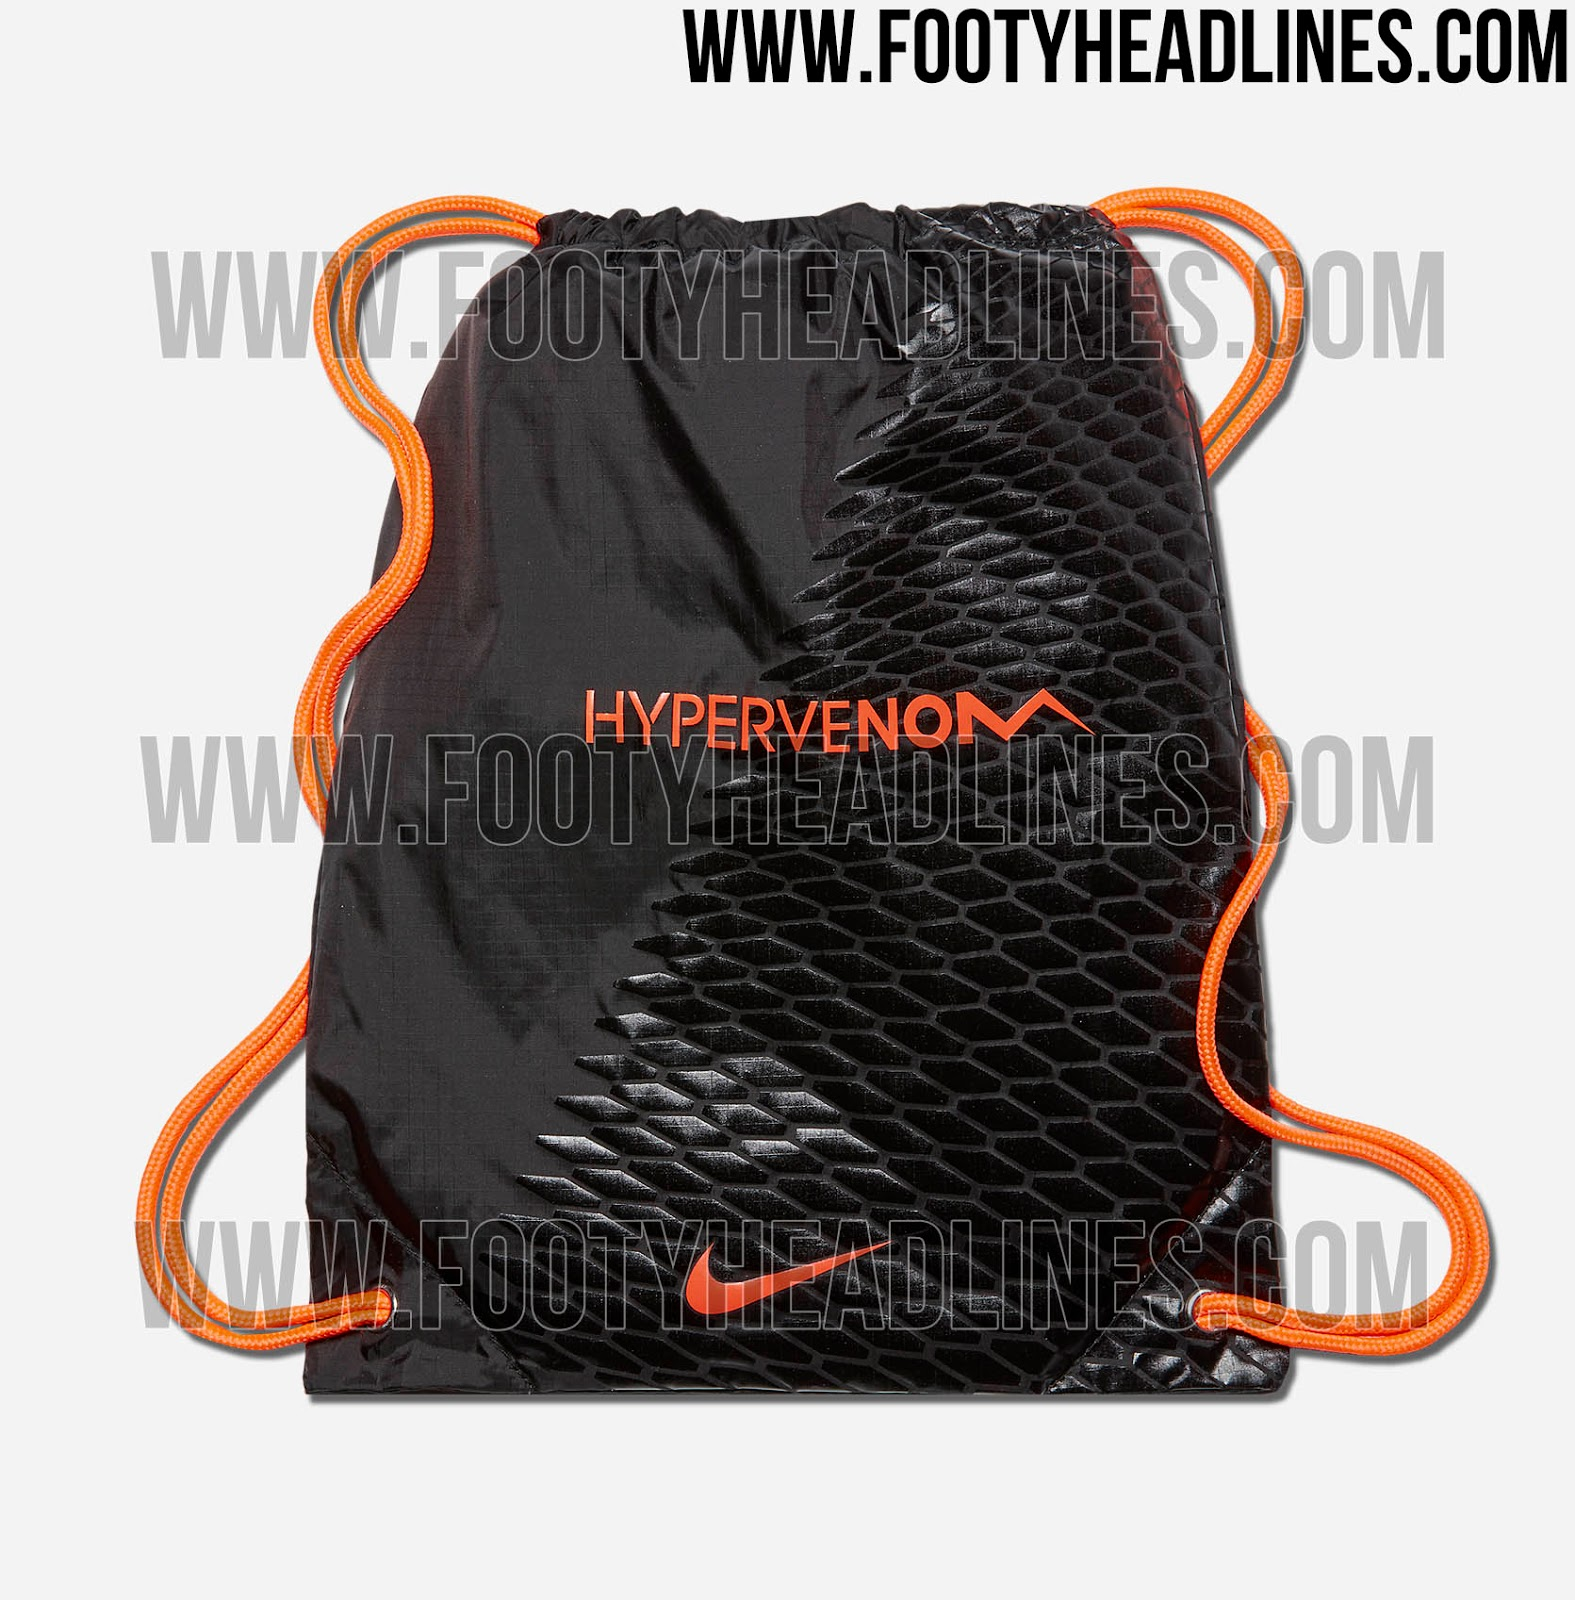 Nike Hypervenom Phantom Iii Fg Electric Green/black/volt